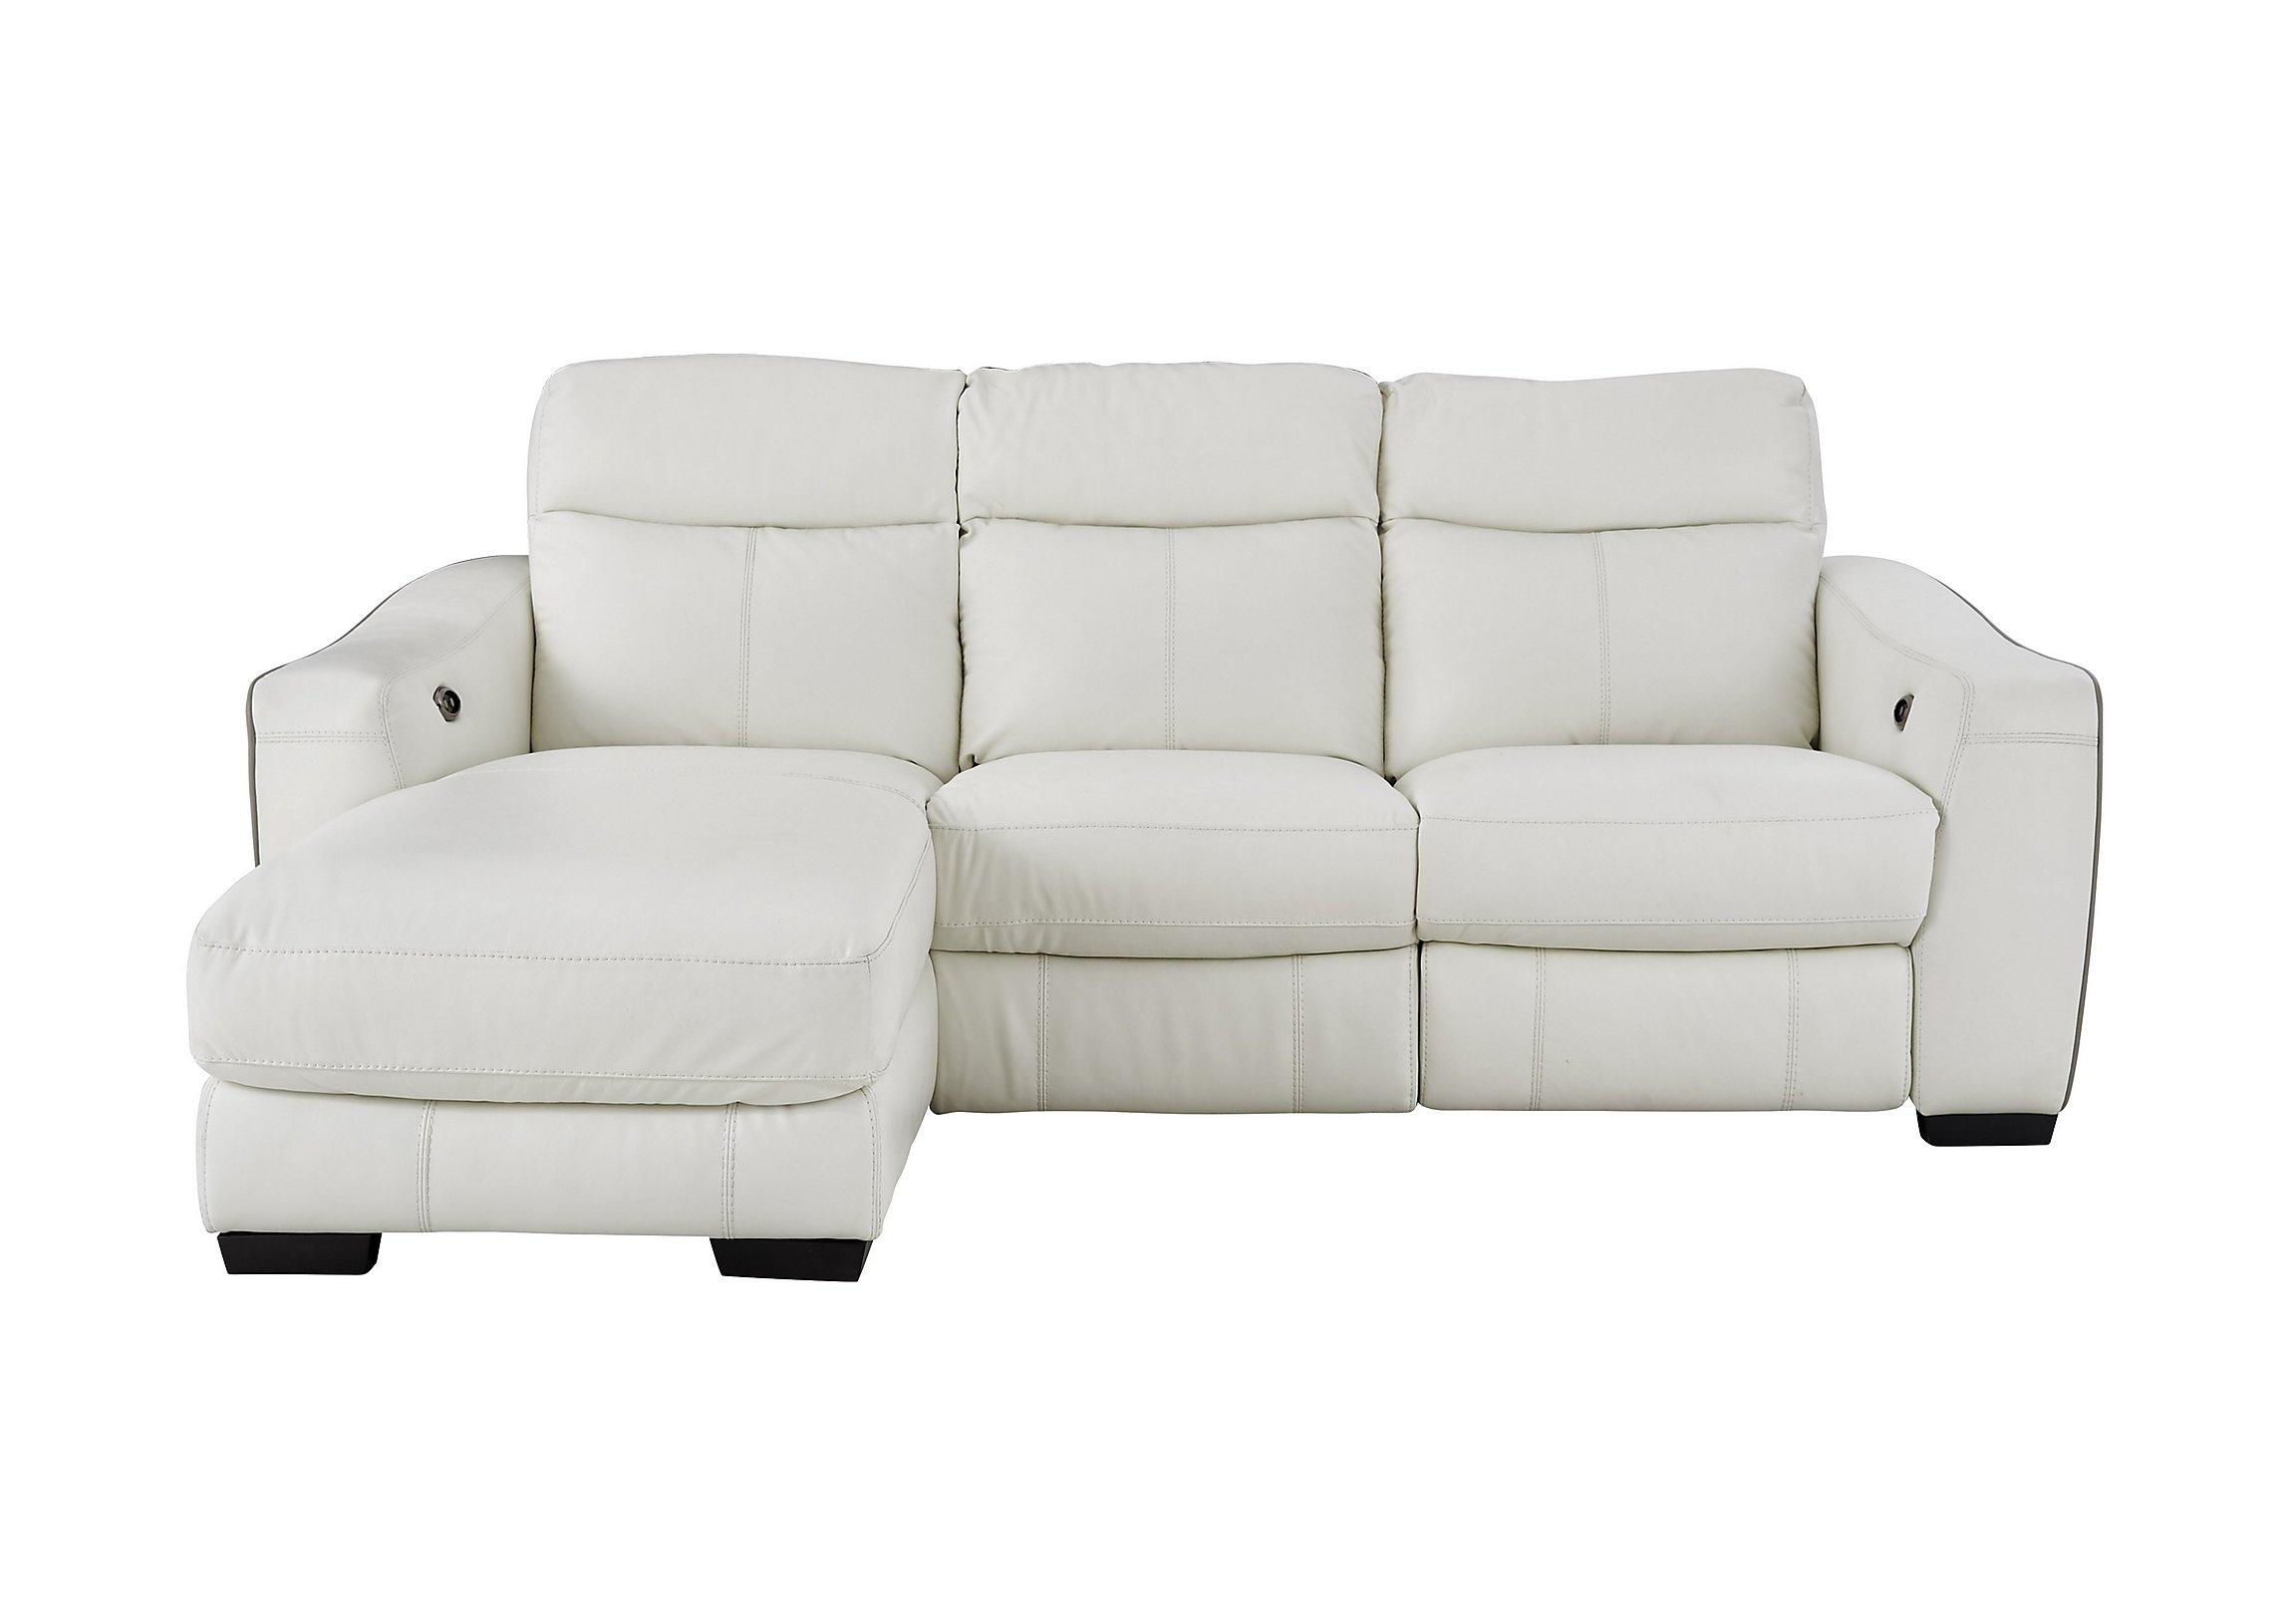 cressida leather recliner corner chaise sofa  furniture village - play